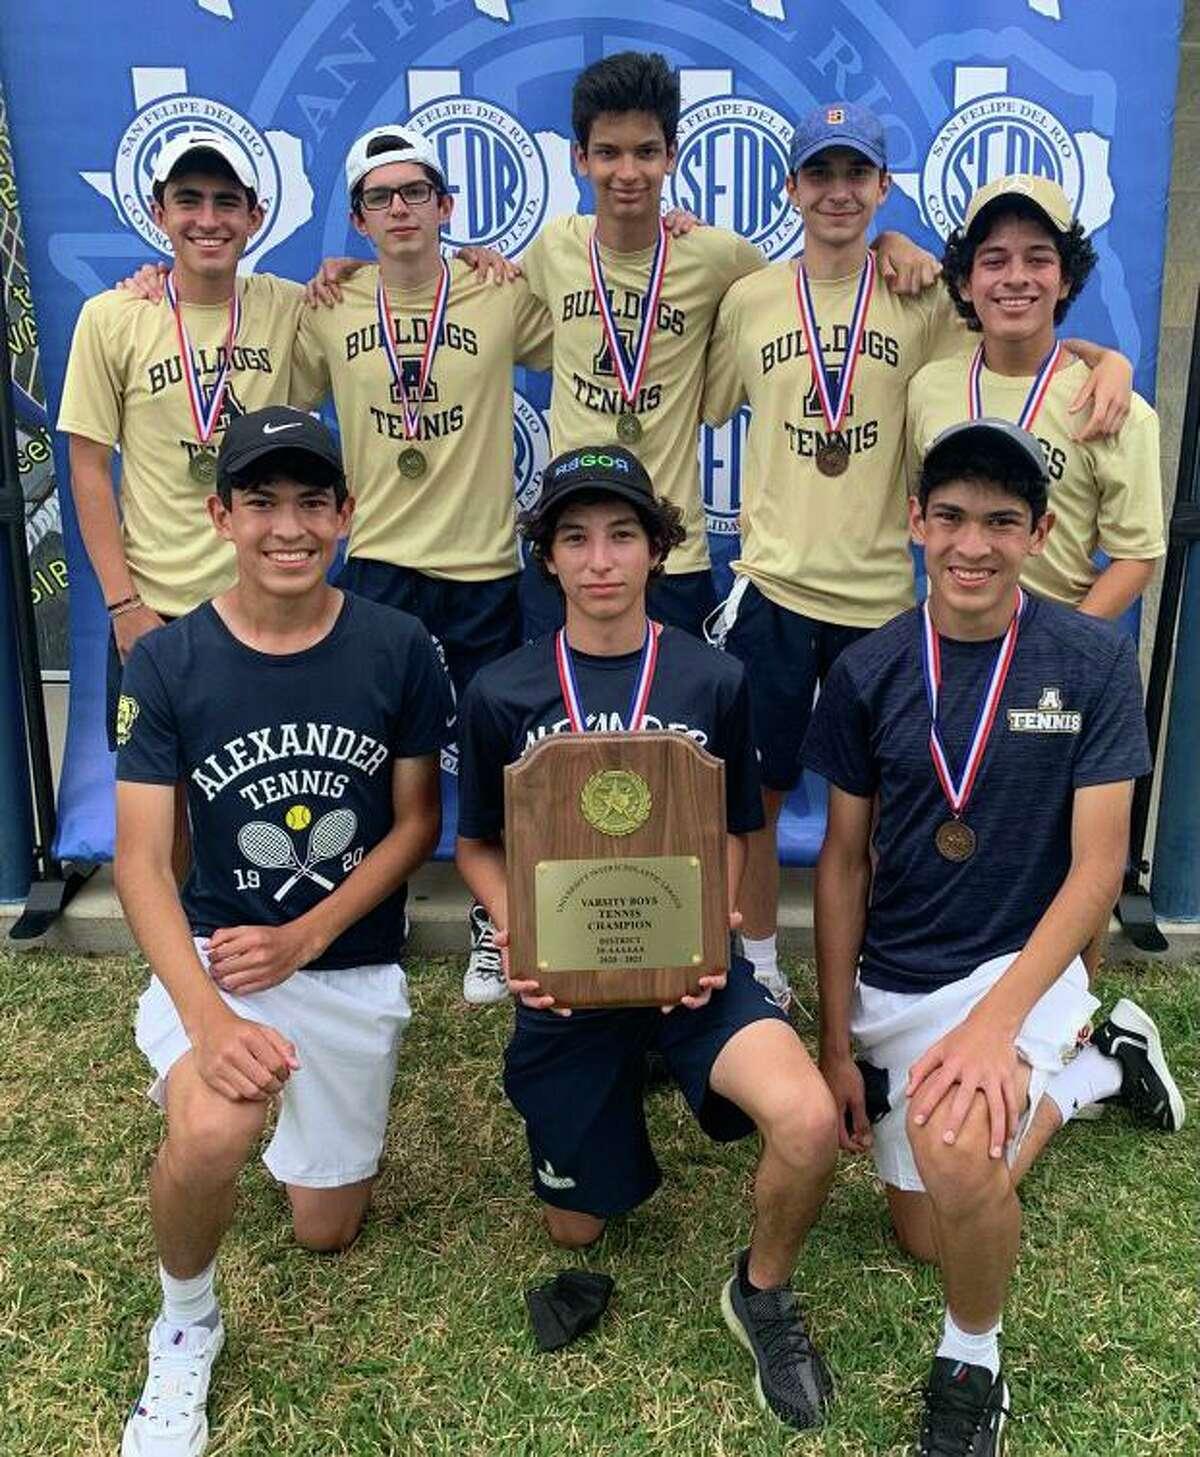 The Alexander boys' tennis team won the District 30-6A meet.